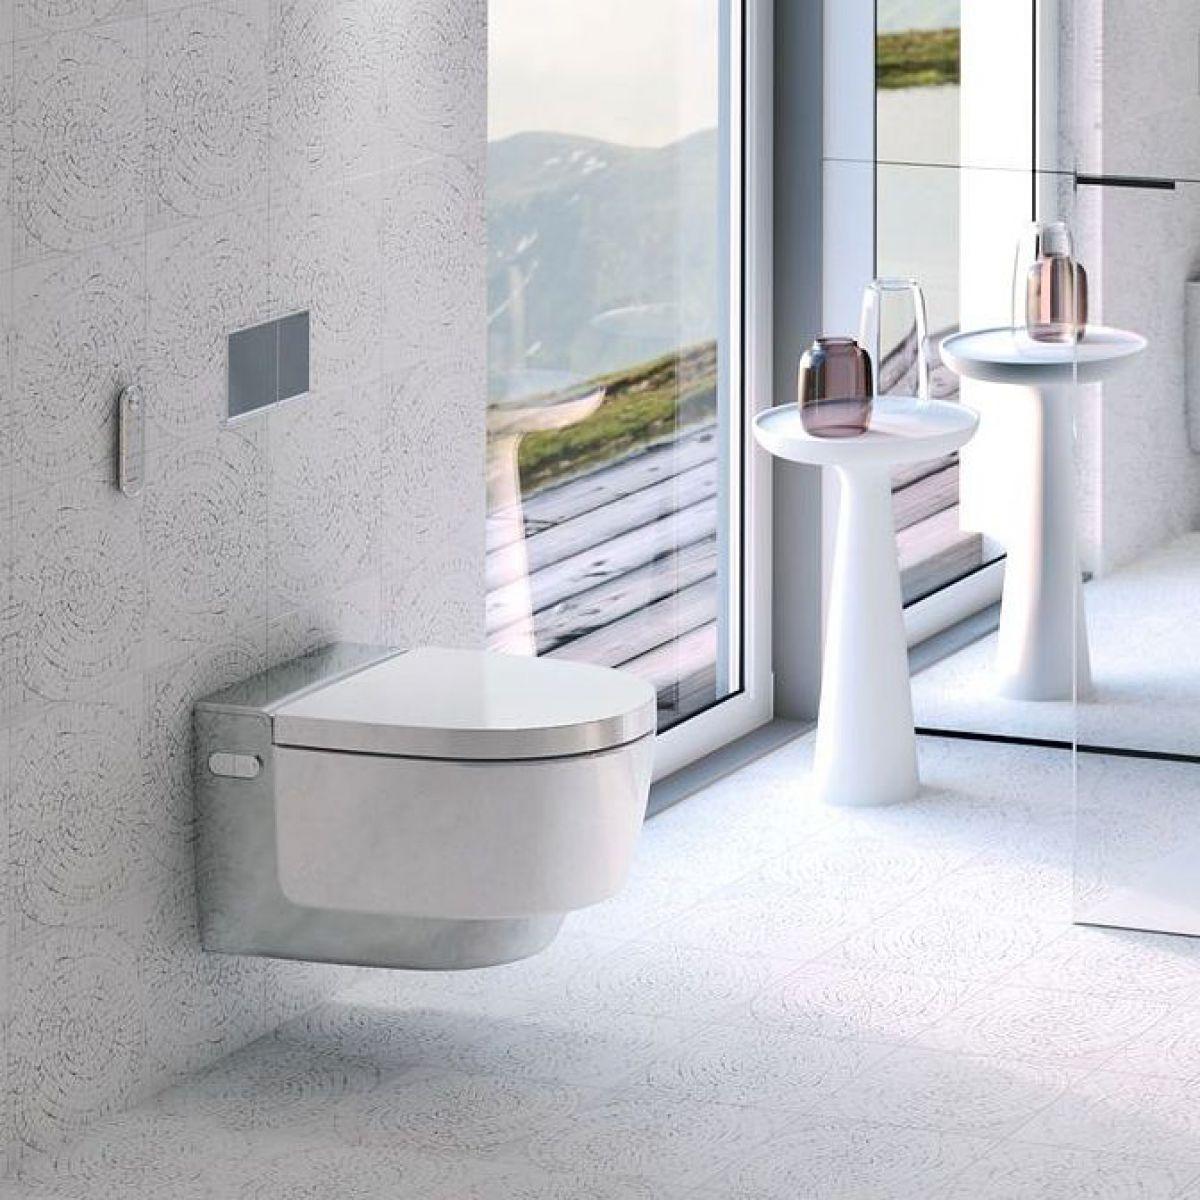 Geberit Aquaclean Mera Classic Shower Toilet : UK Bathrooms